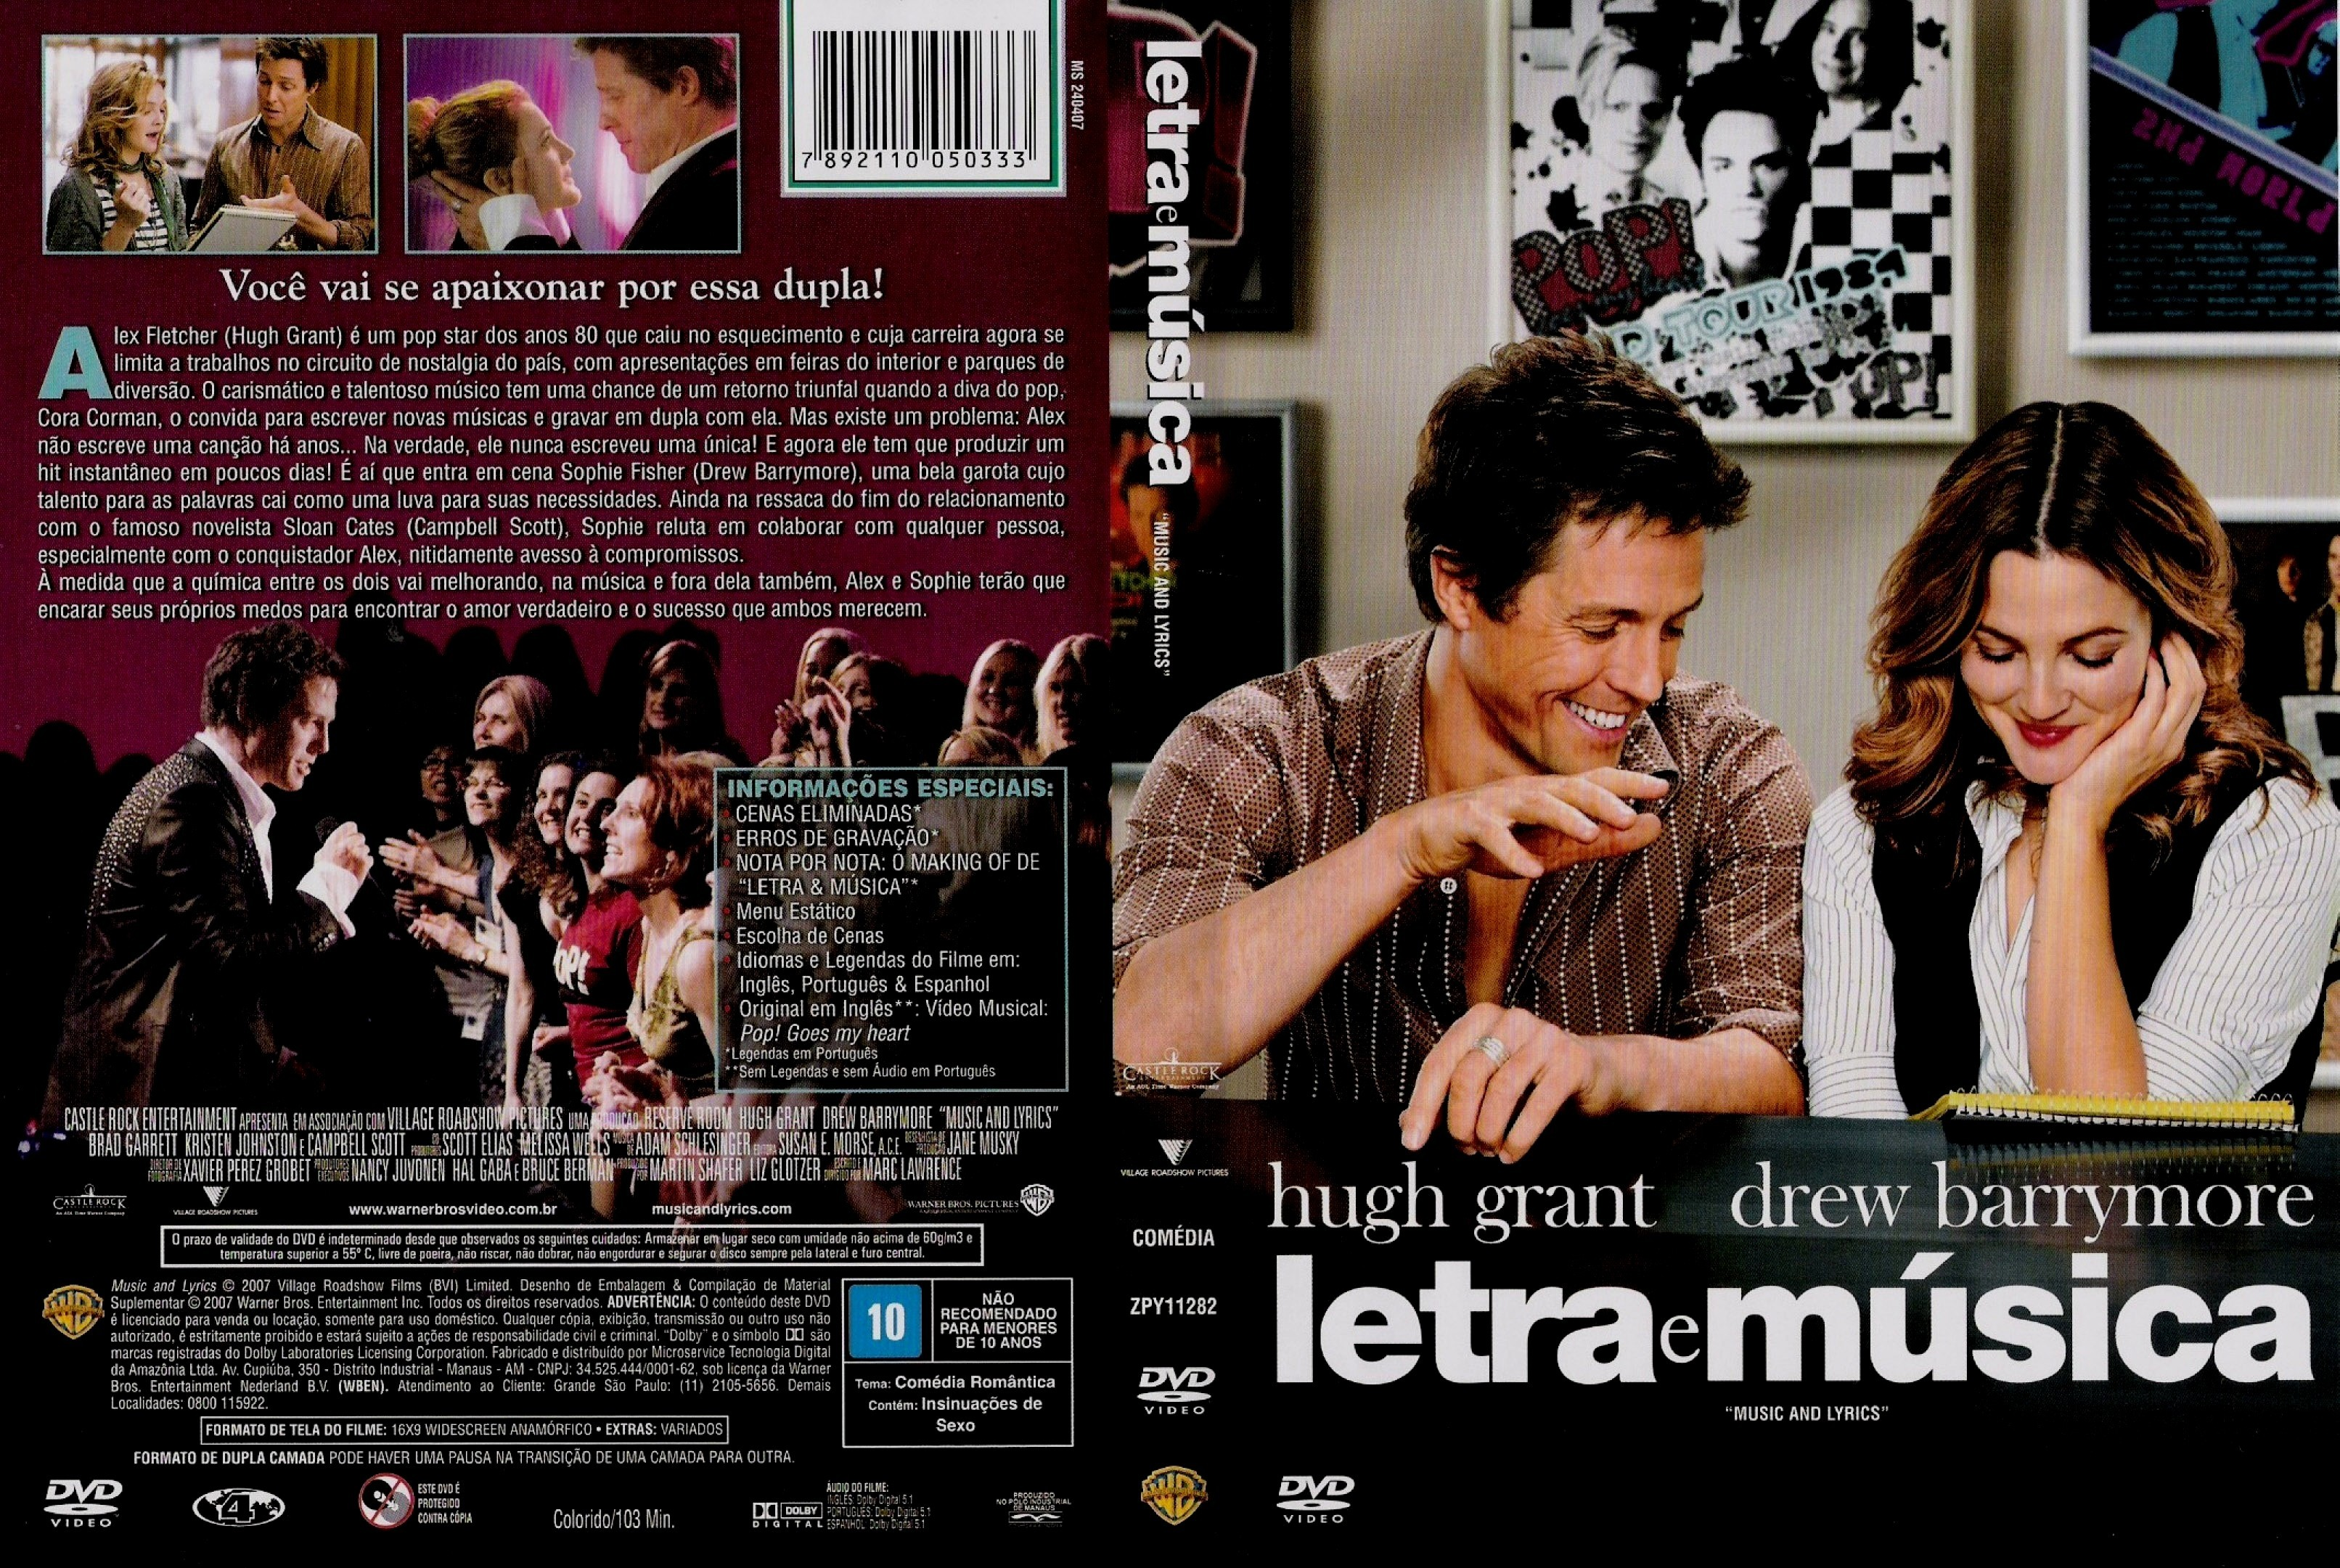 music_and_lyrics_brazilian_r4-cdcovers_cc-front